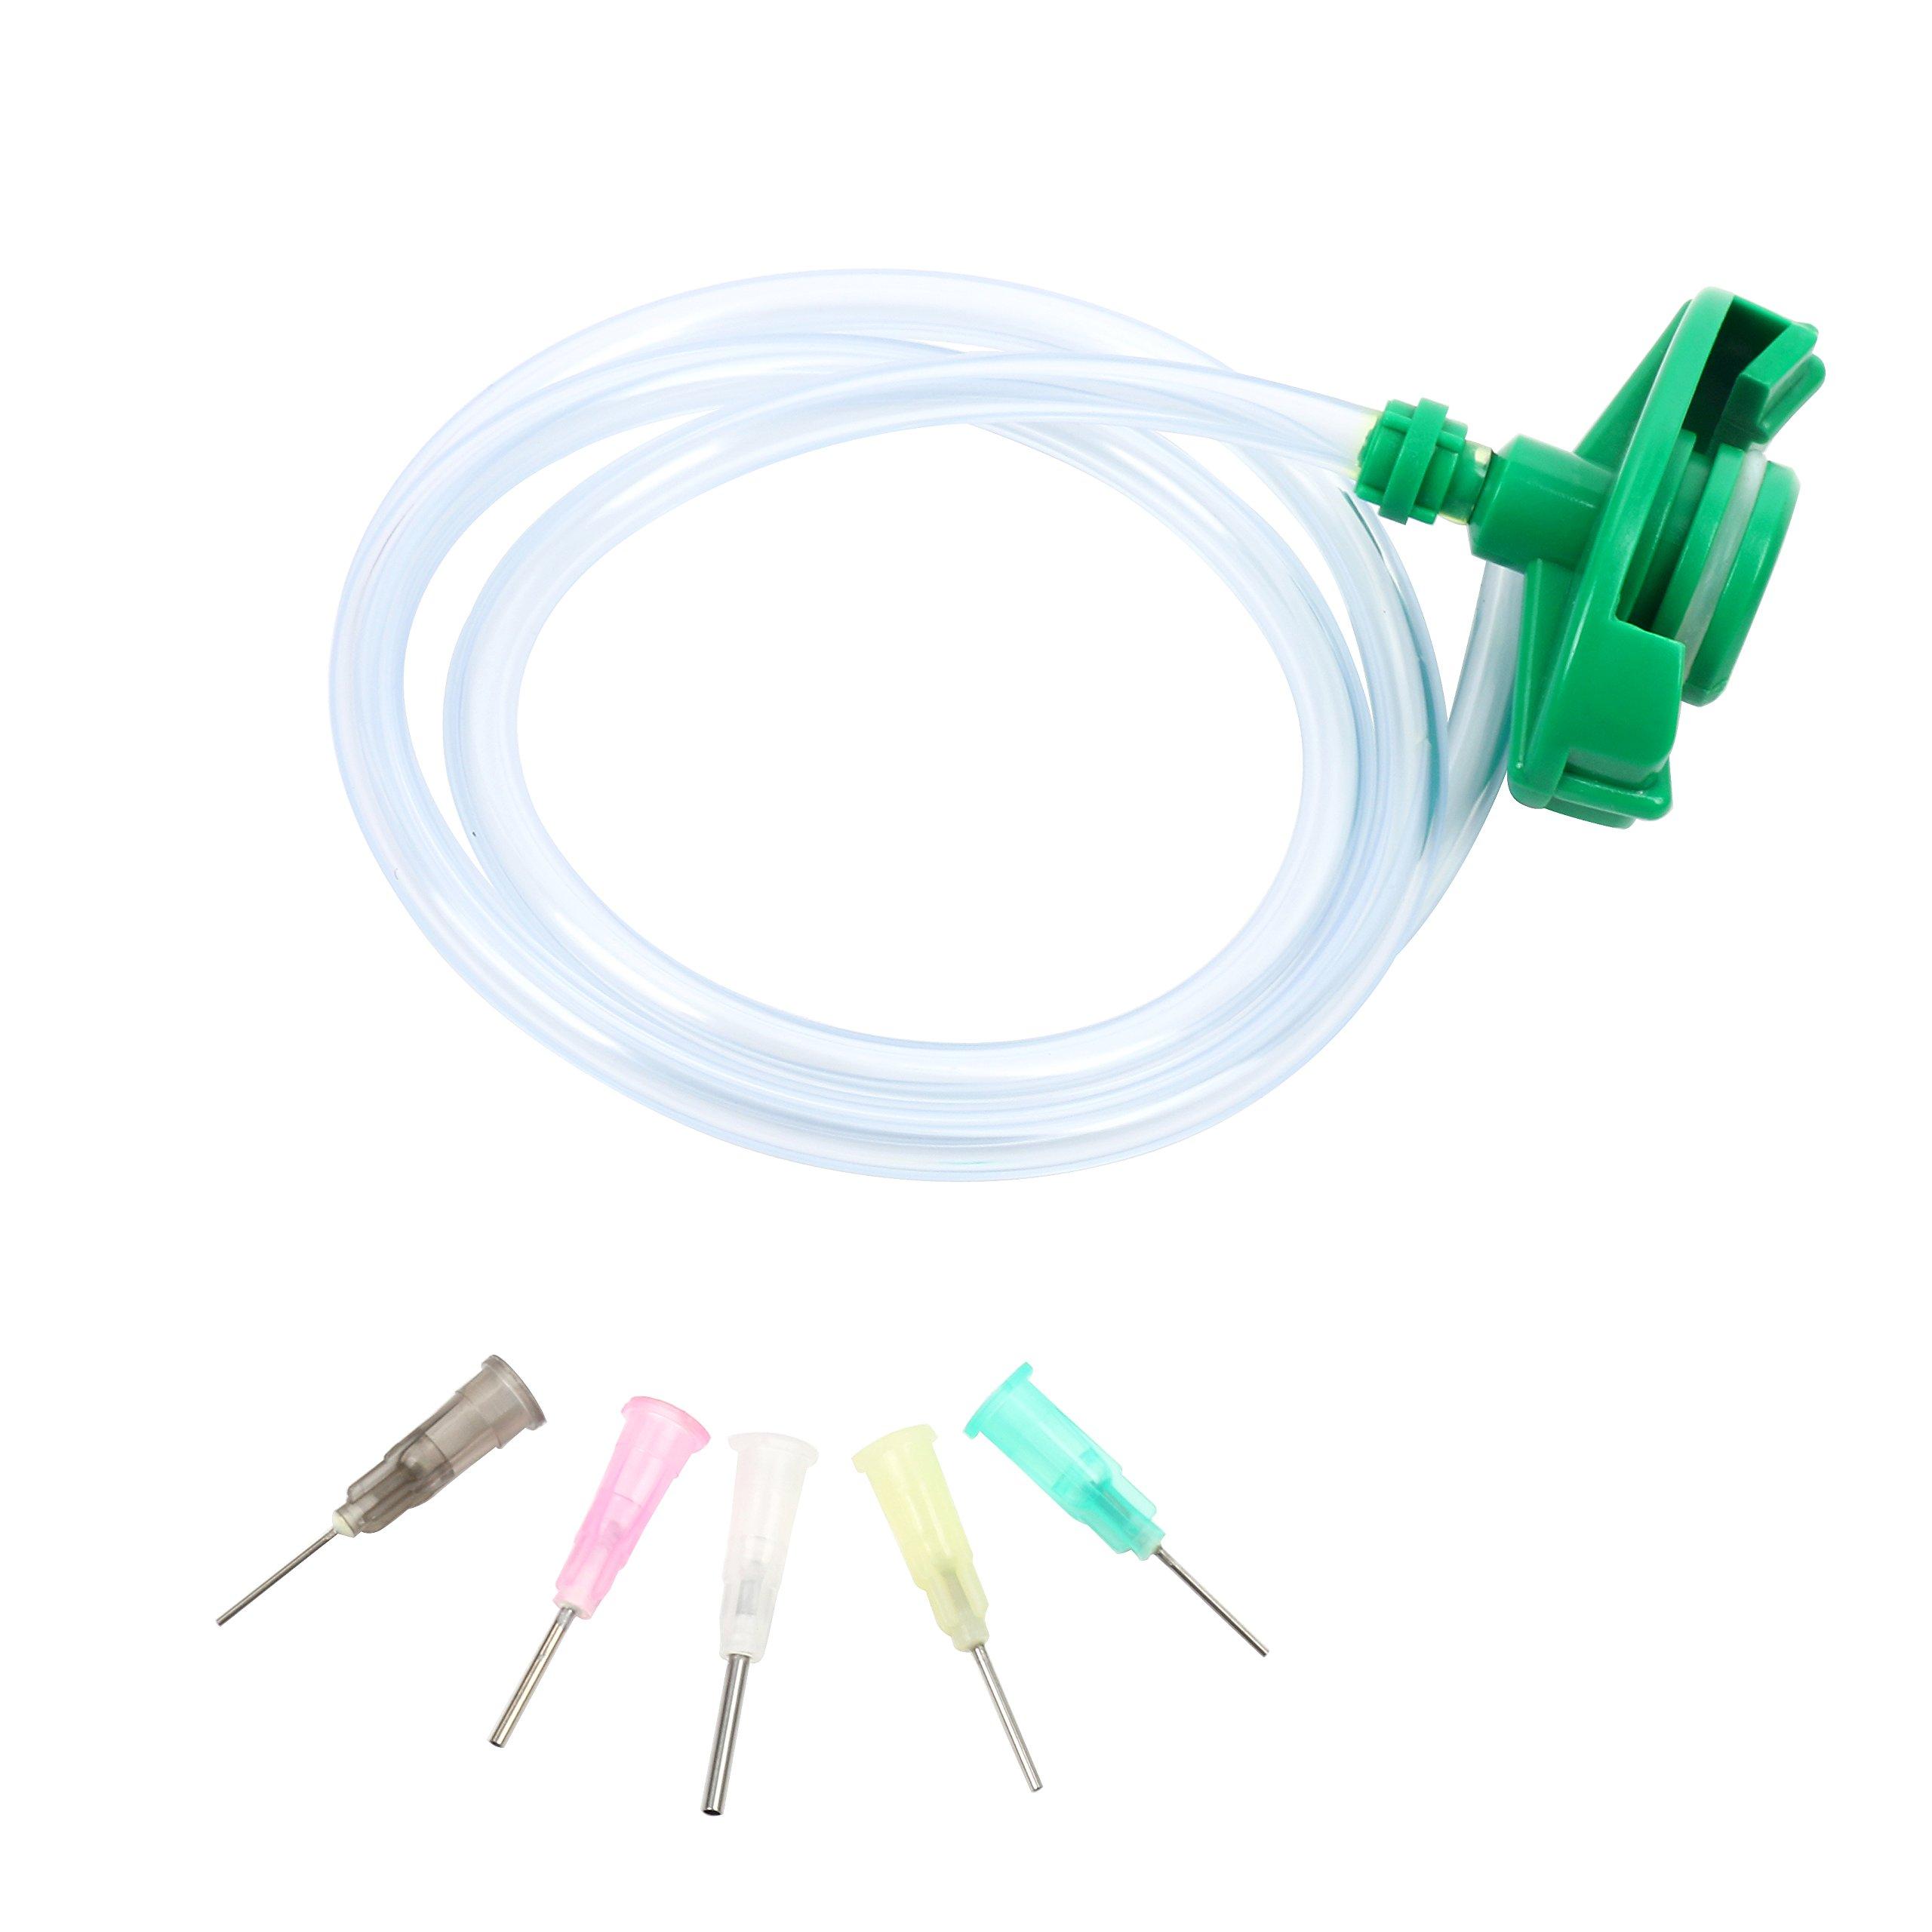 Digital Display Auto Glue Dispenser Solder Paste Liquid Controller Dropper 983A by YaeCCC (Image #8)